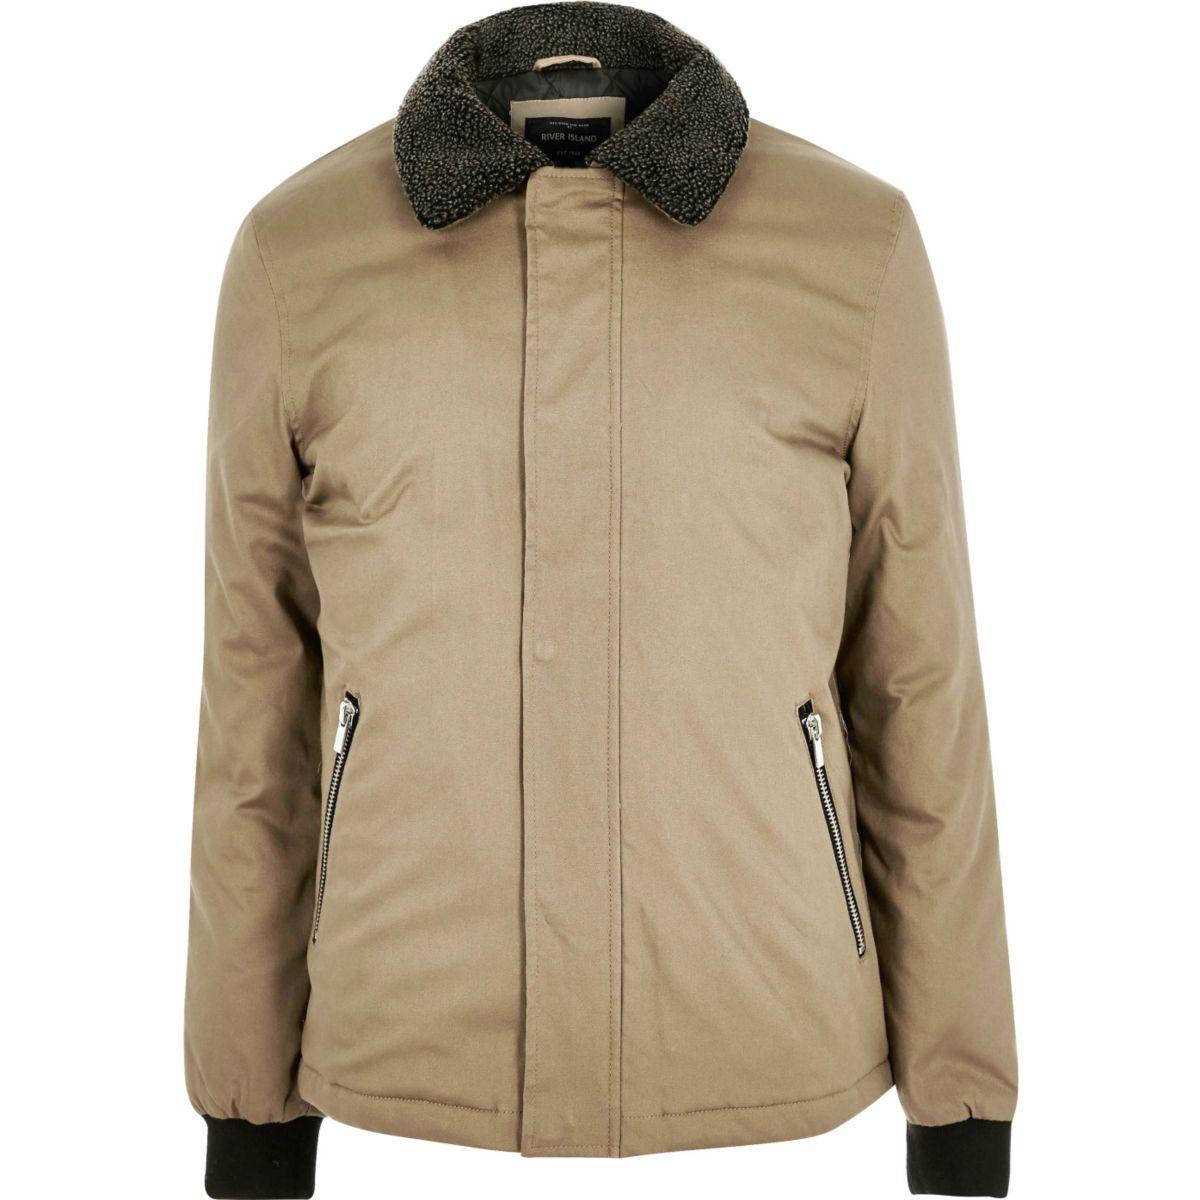 Stone borg collar jacket